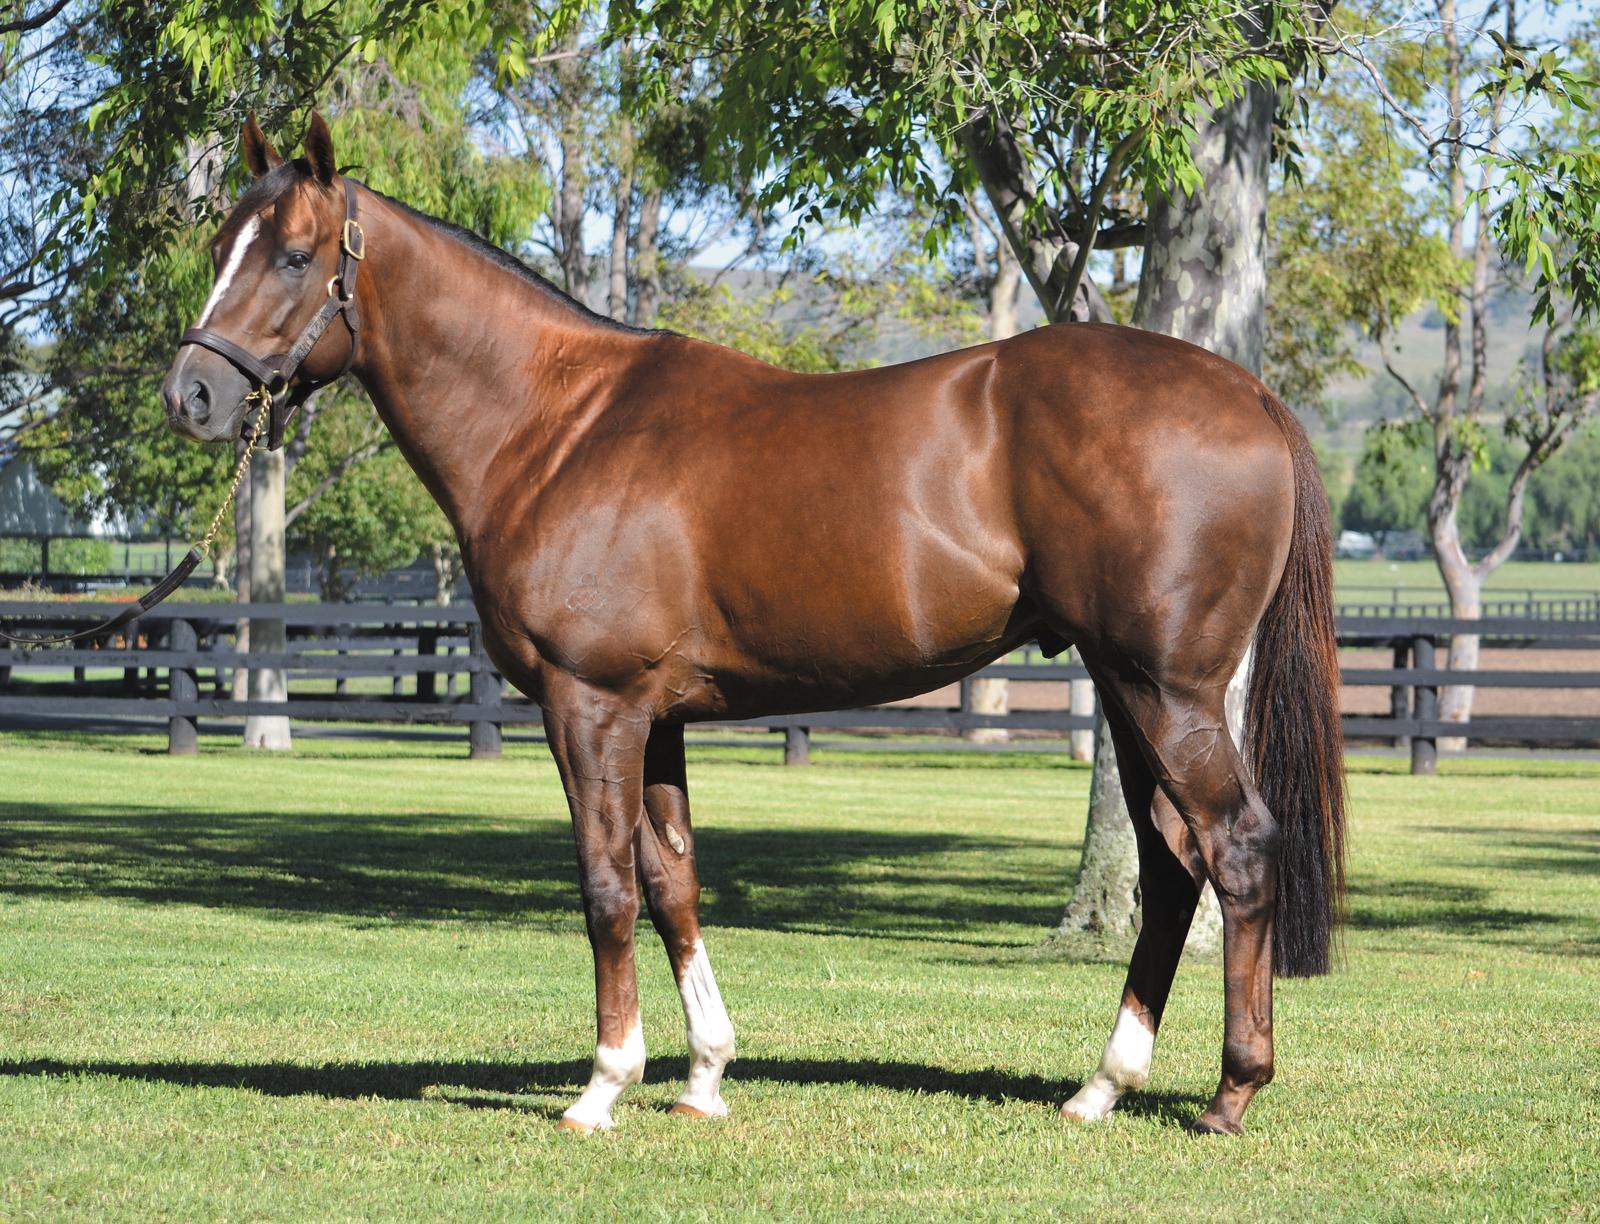 https://www.stallions.com.au/wp-content/uploads/2019/09/Showtime_2019-web.jpg